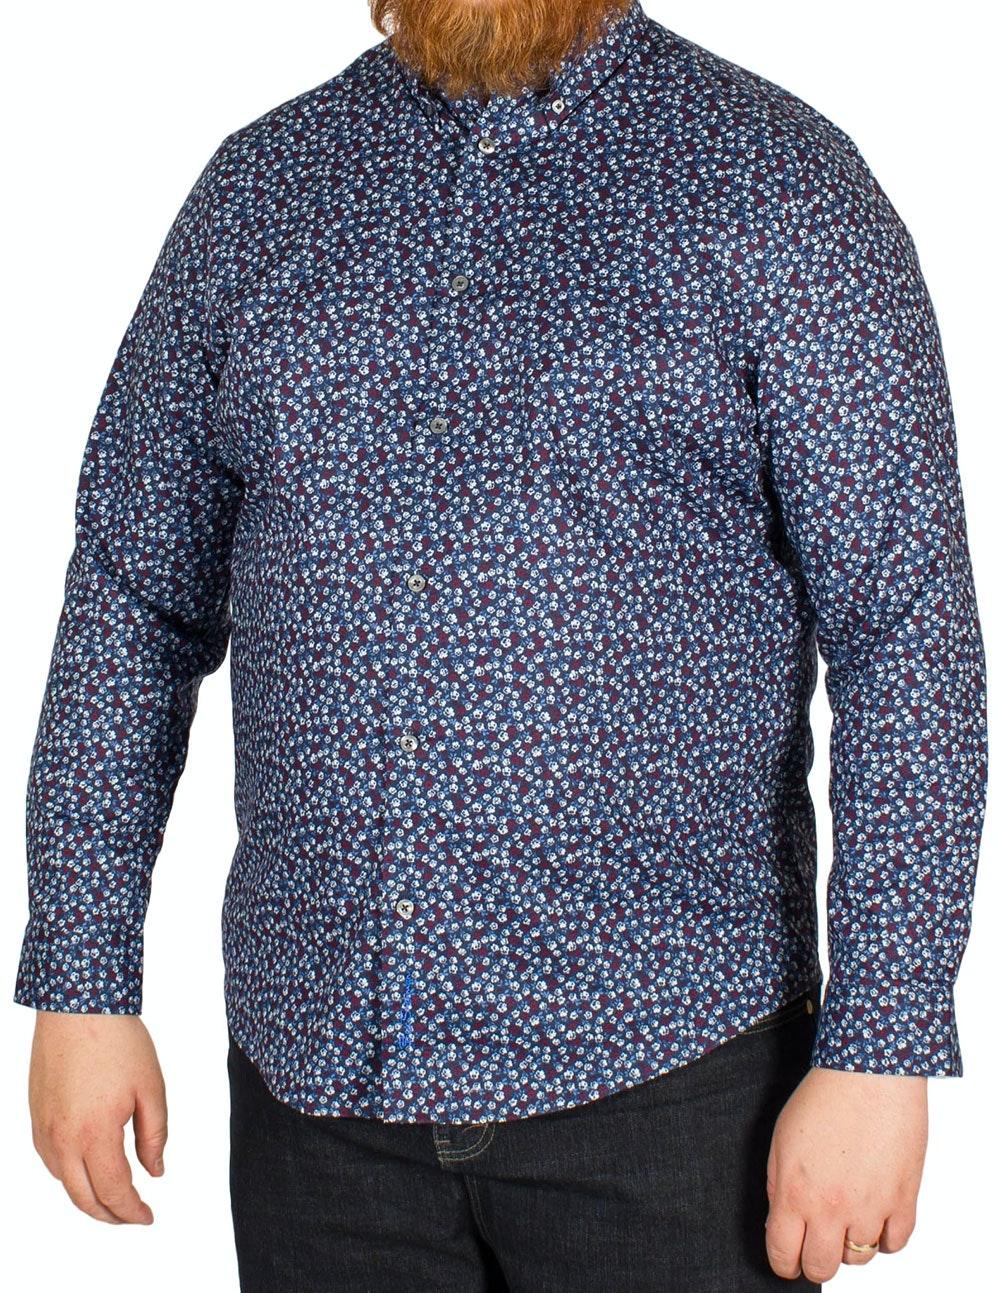 Ben Sherman Floral Print Shirt Navy